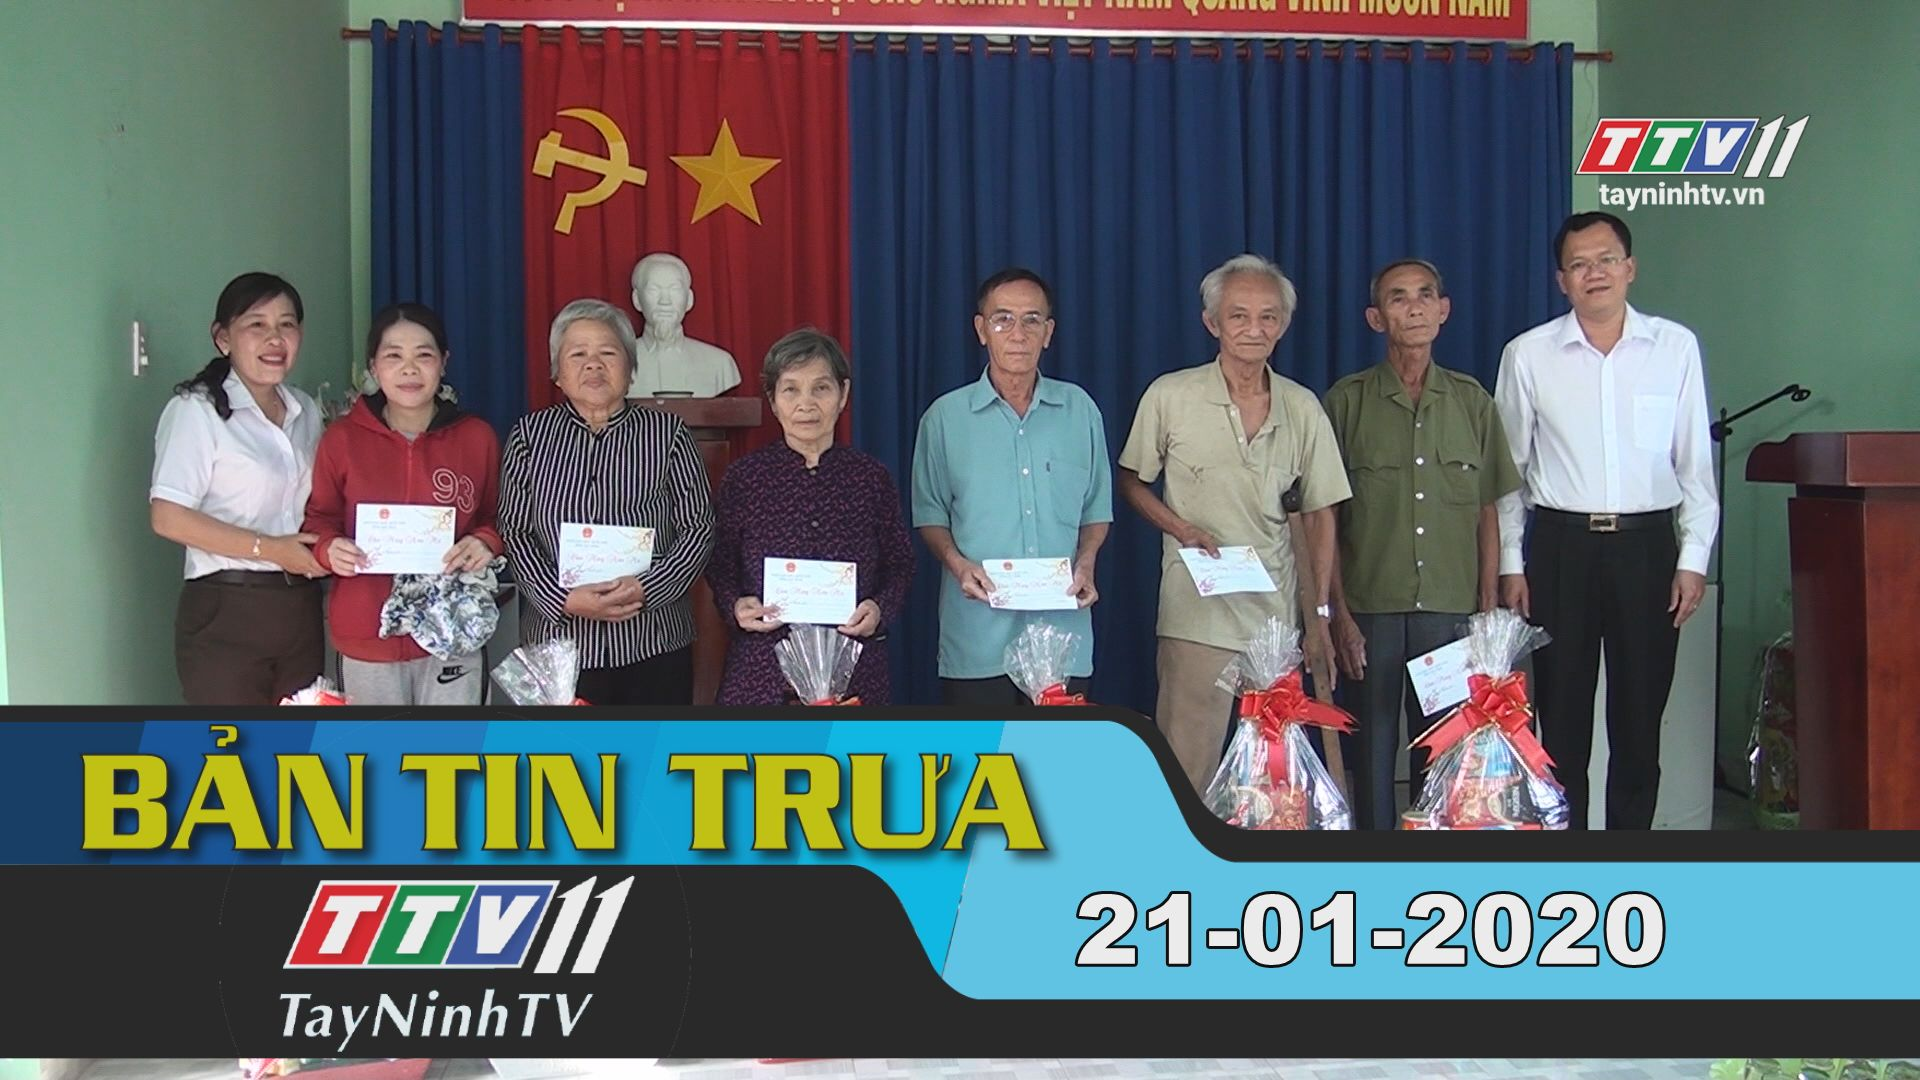 Bản tin trưa 21-01-2020 | Tin tức hôm nay | TayNinhTV